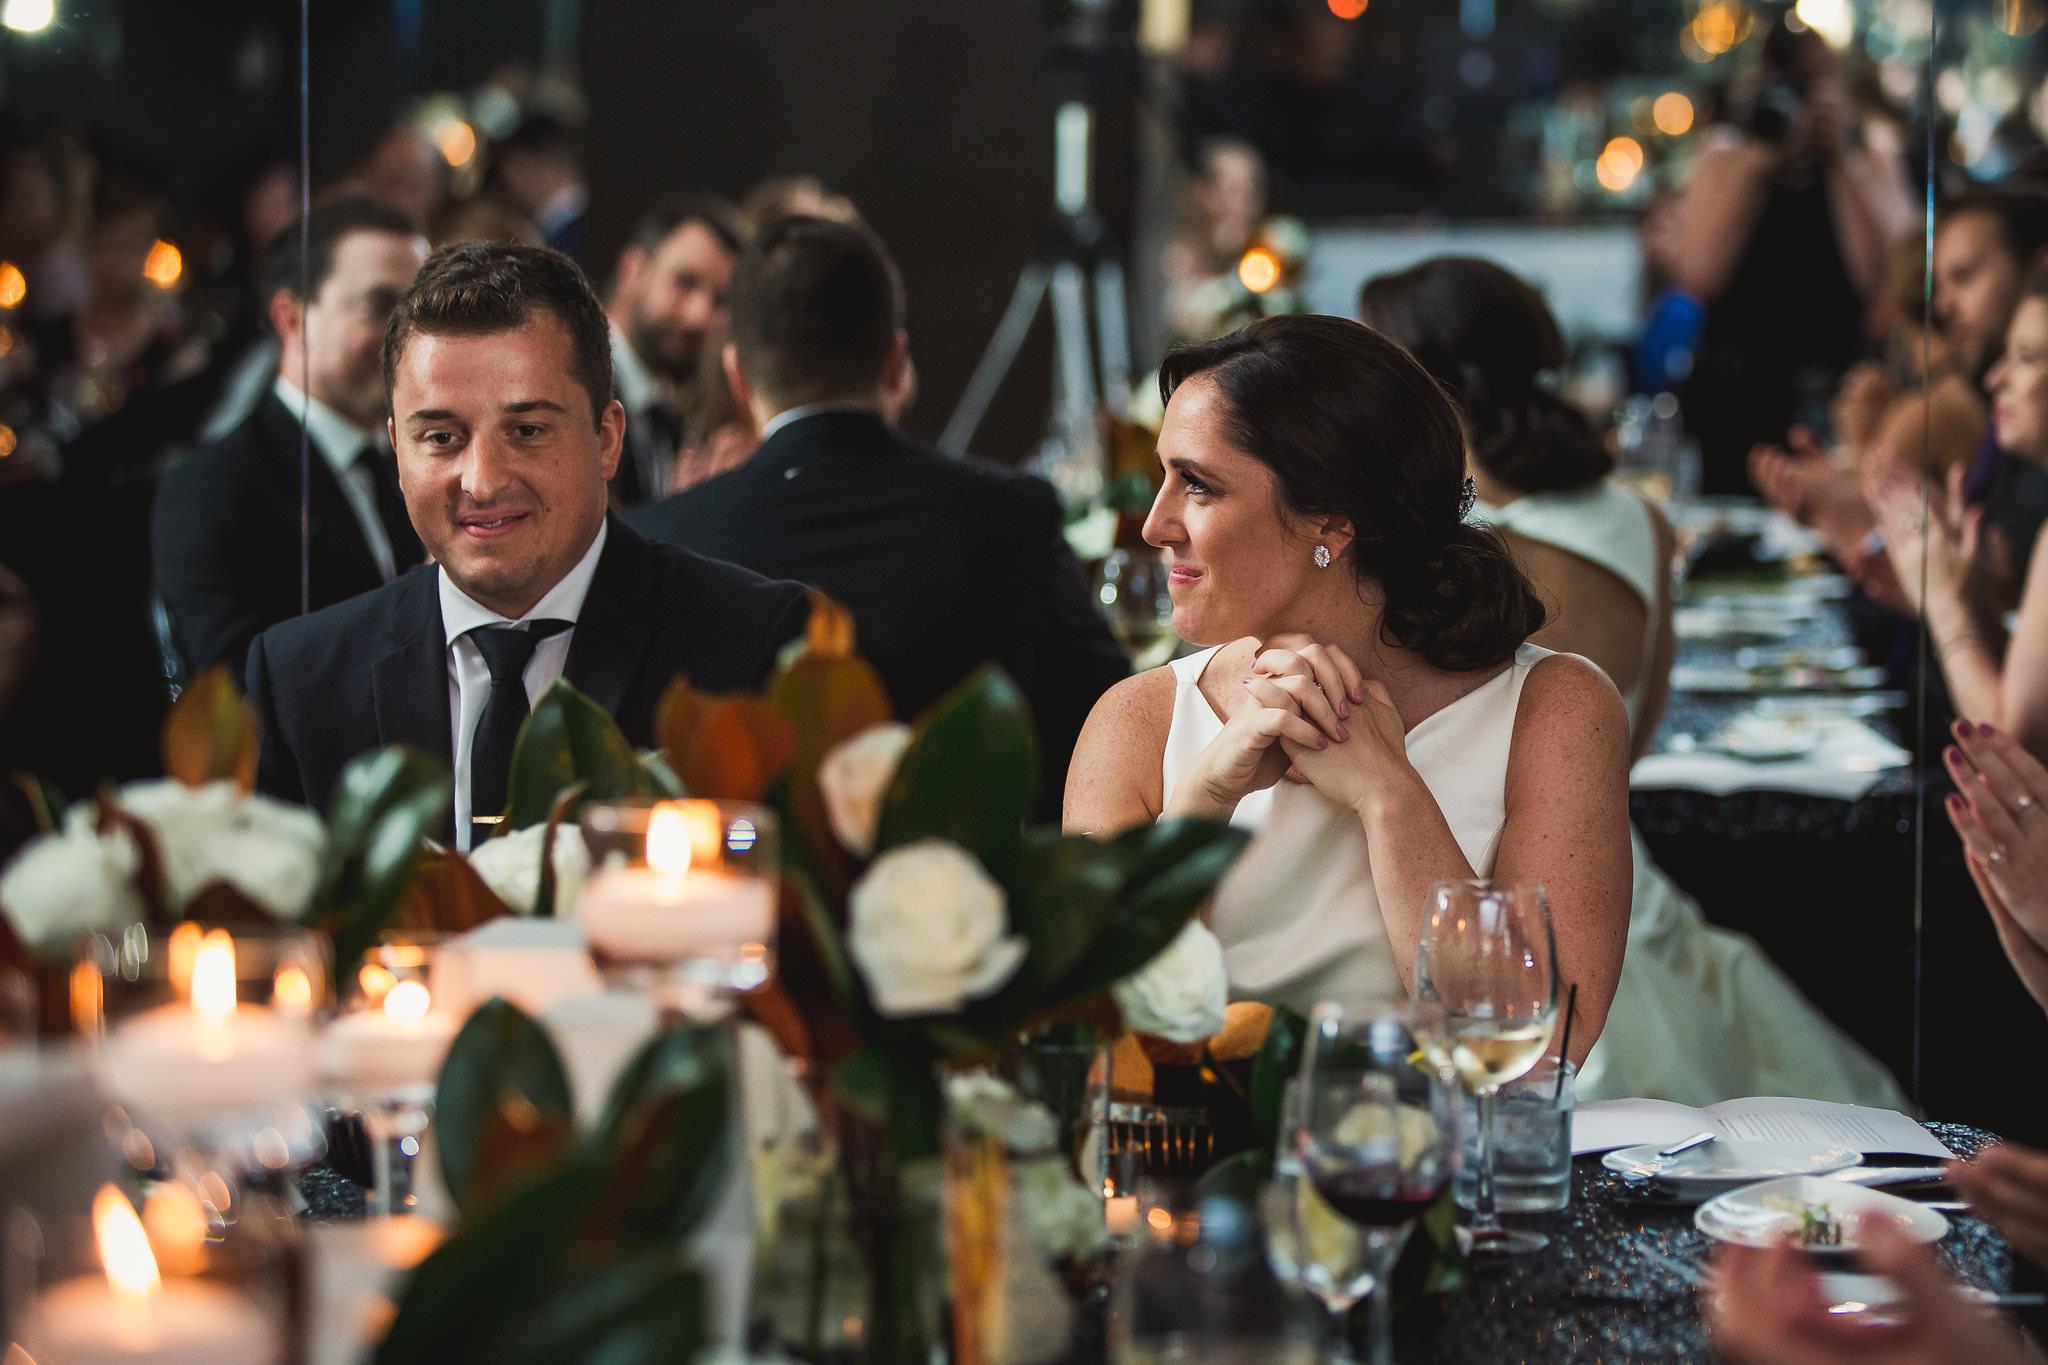 Cristin Rob Thompson Hotel Wedding Photos 620 - Thompson Hotel Wedding Photos